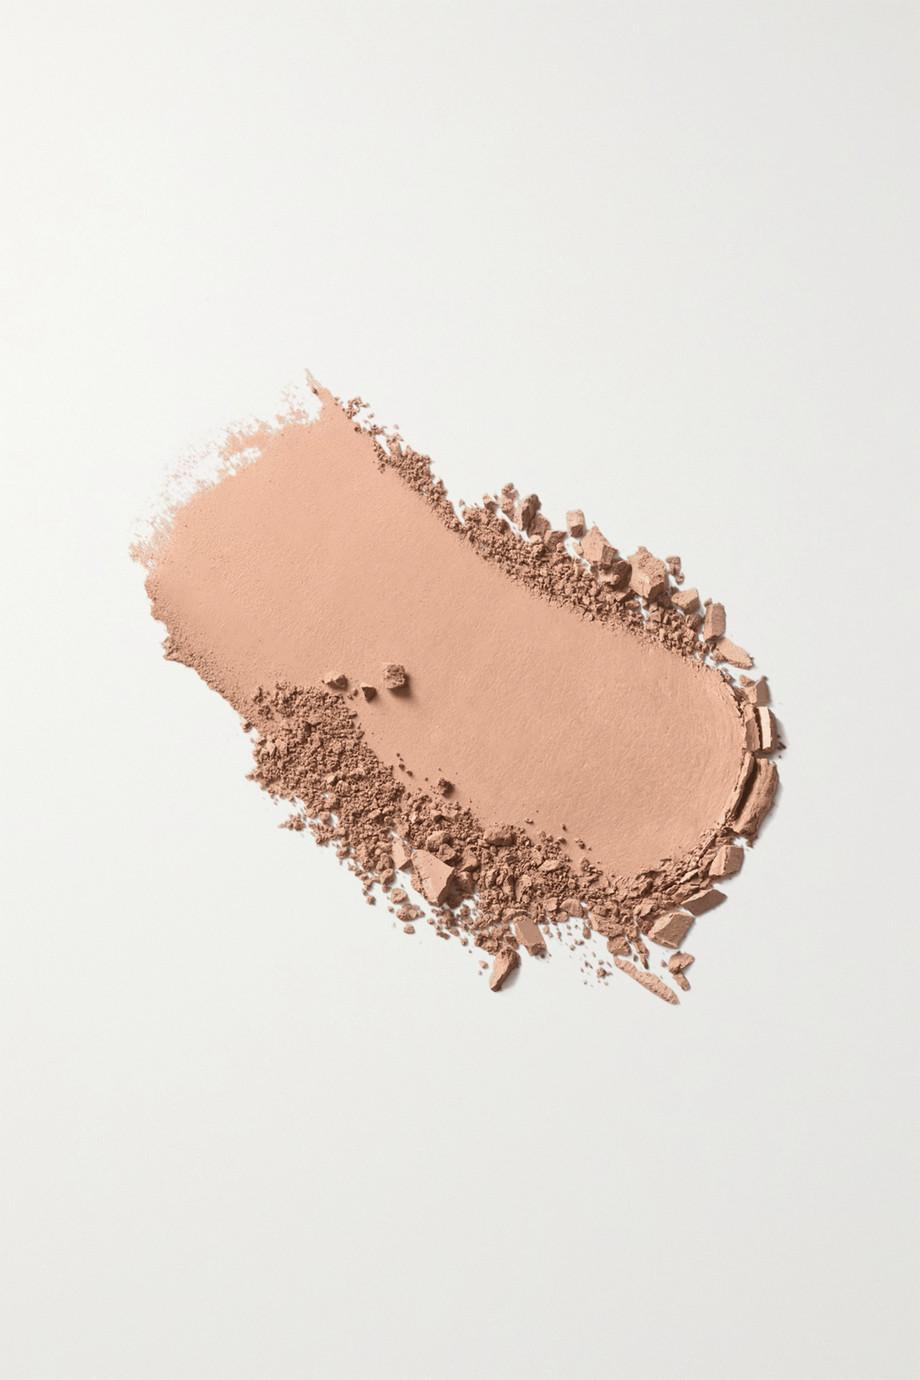 La Mer The Soft Moisture Powder Foundation SPF30 Refill - Blossom